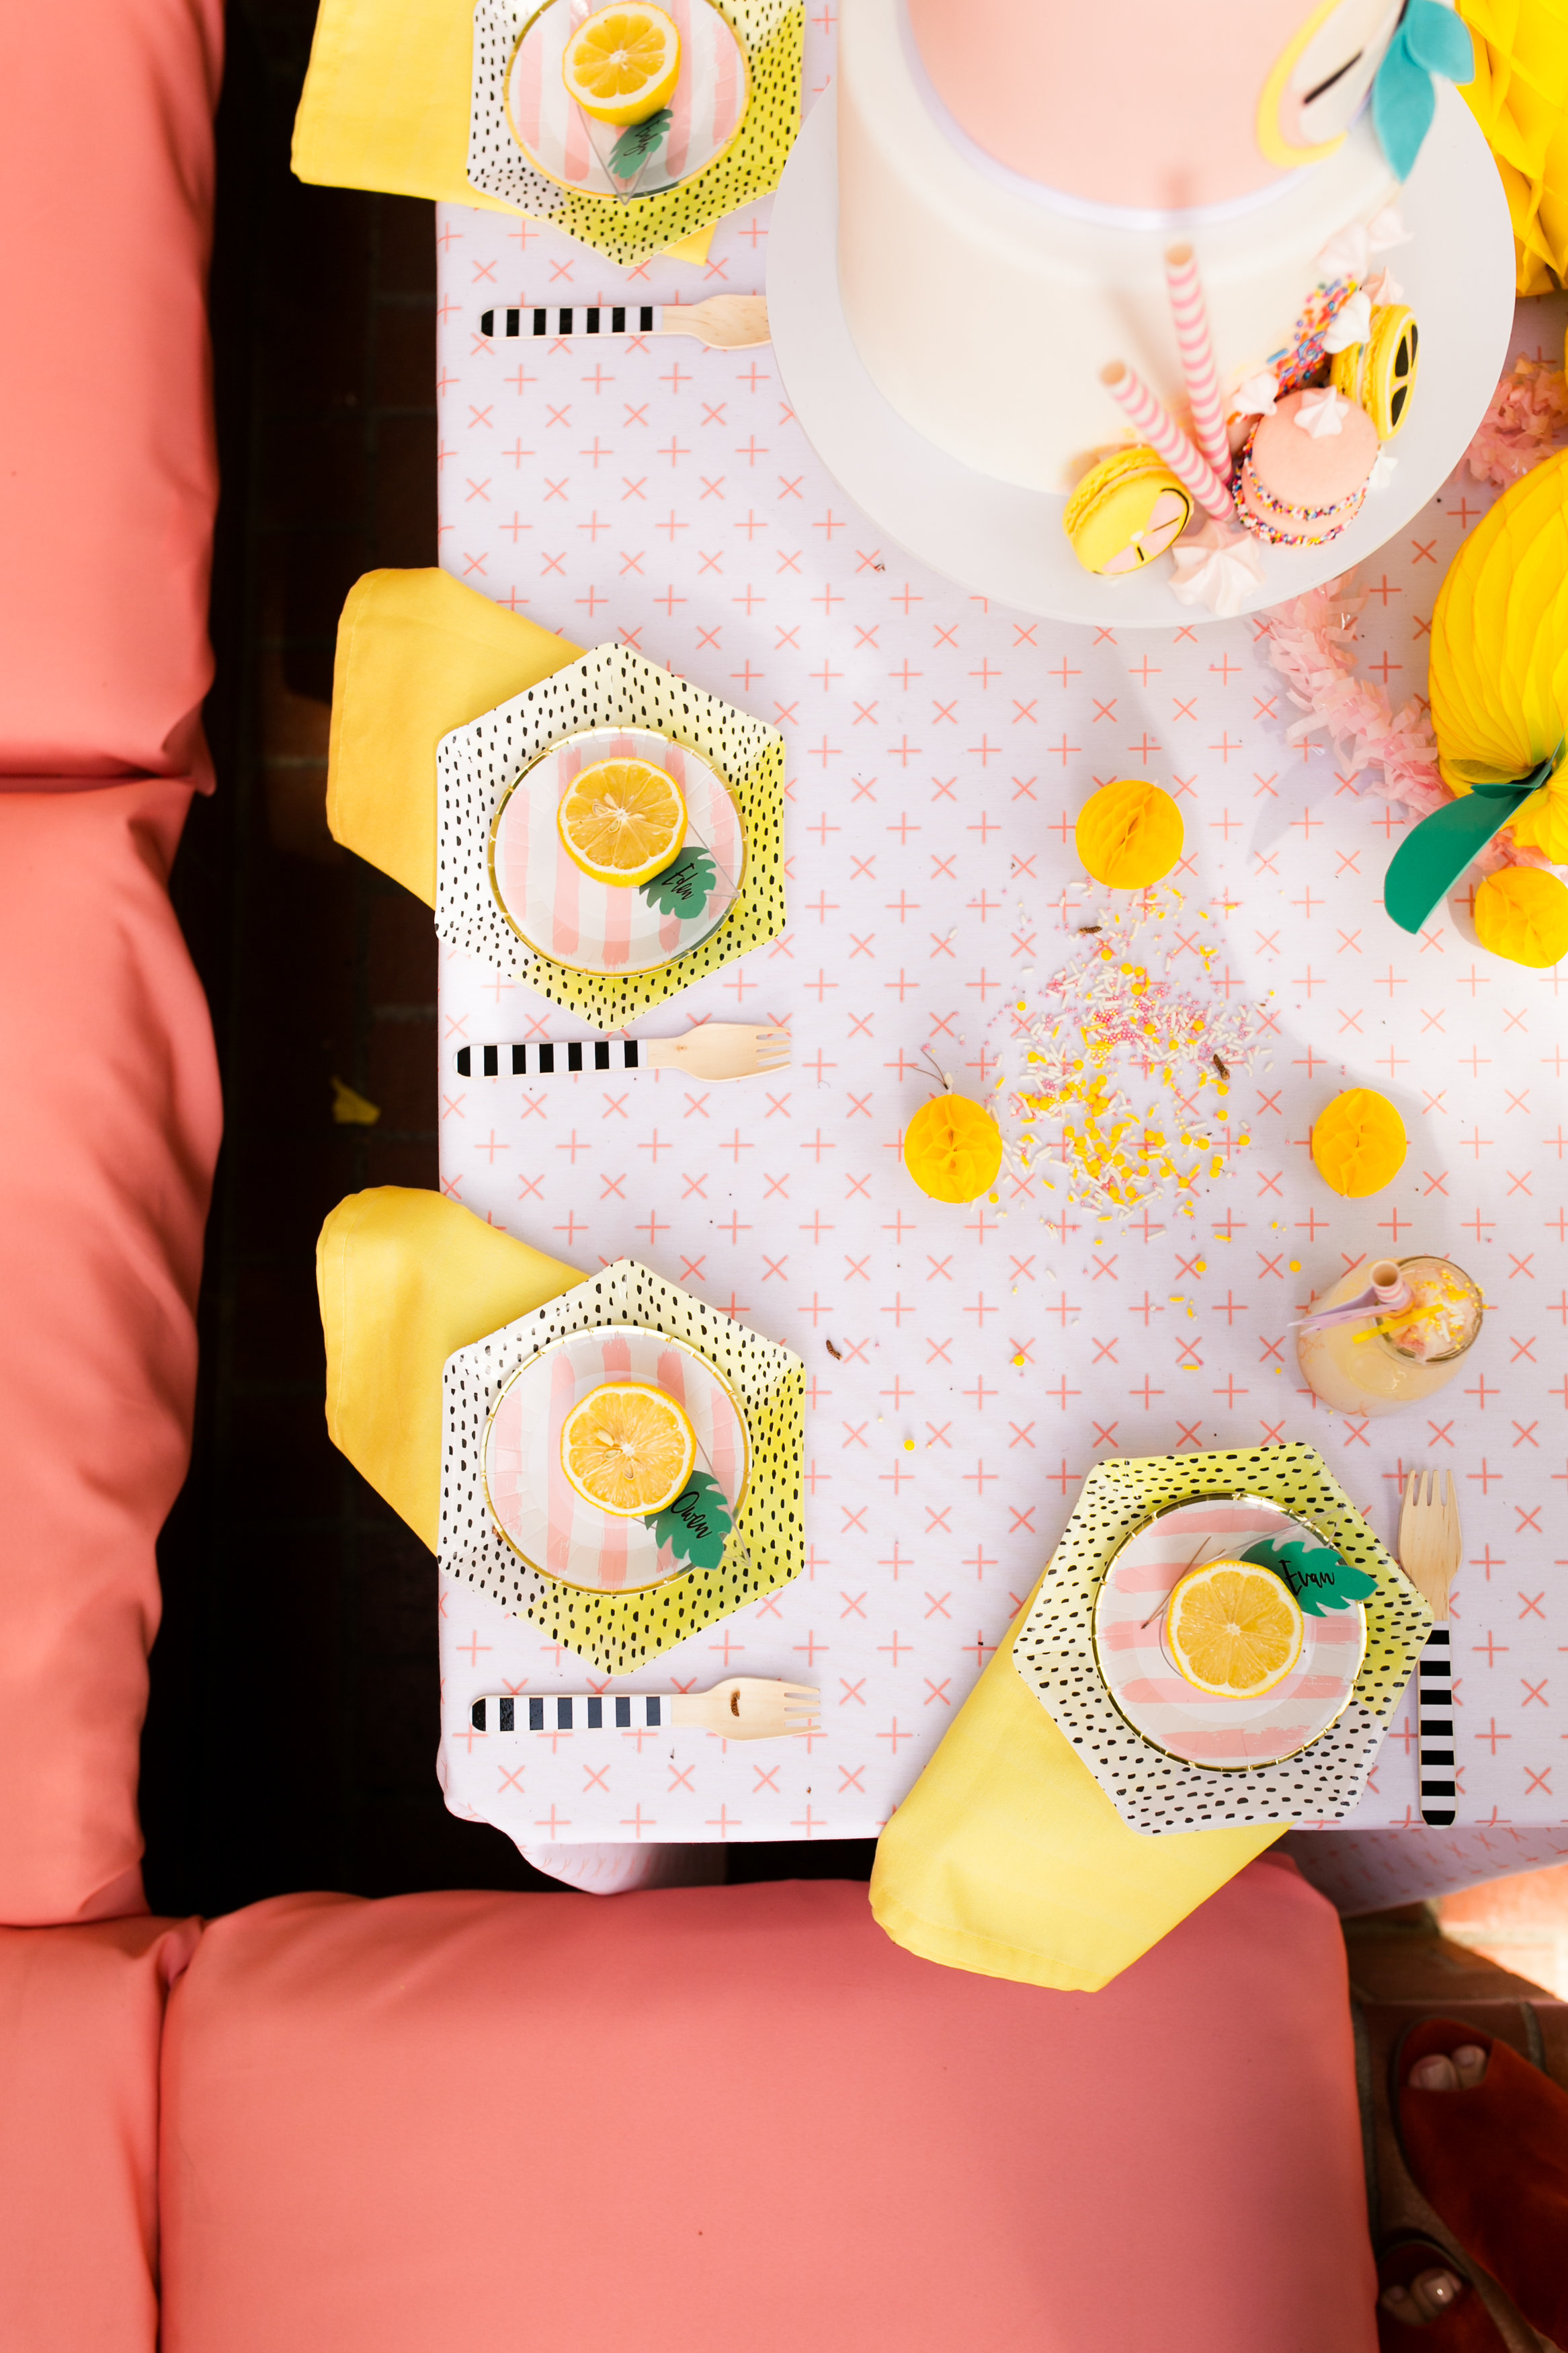 Lemonade Kids Birthday Party - Tabletop Decor